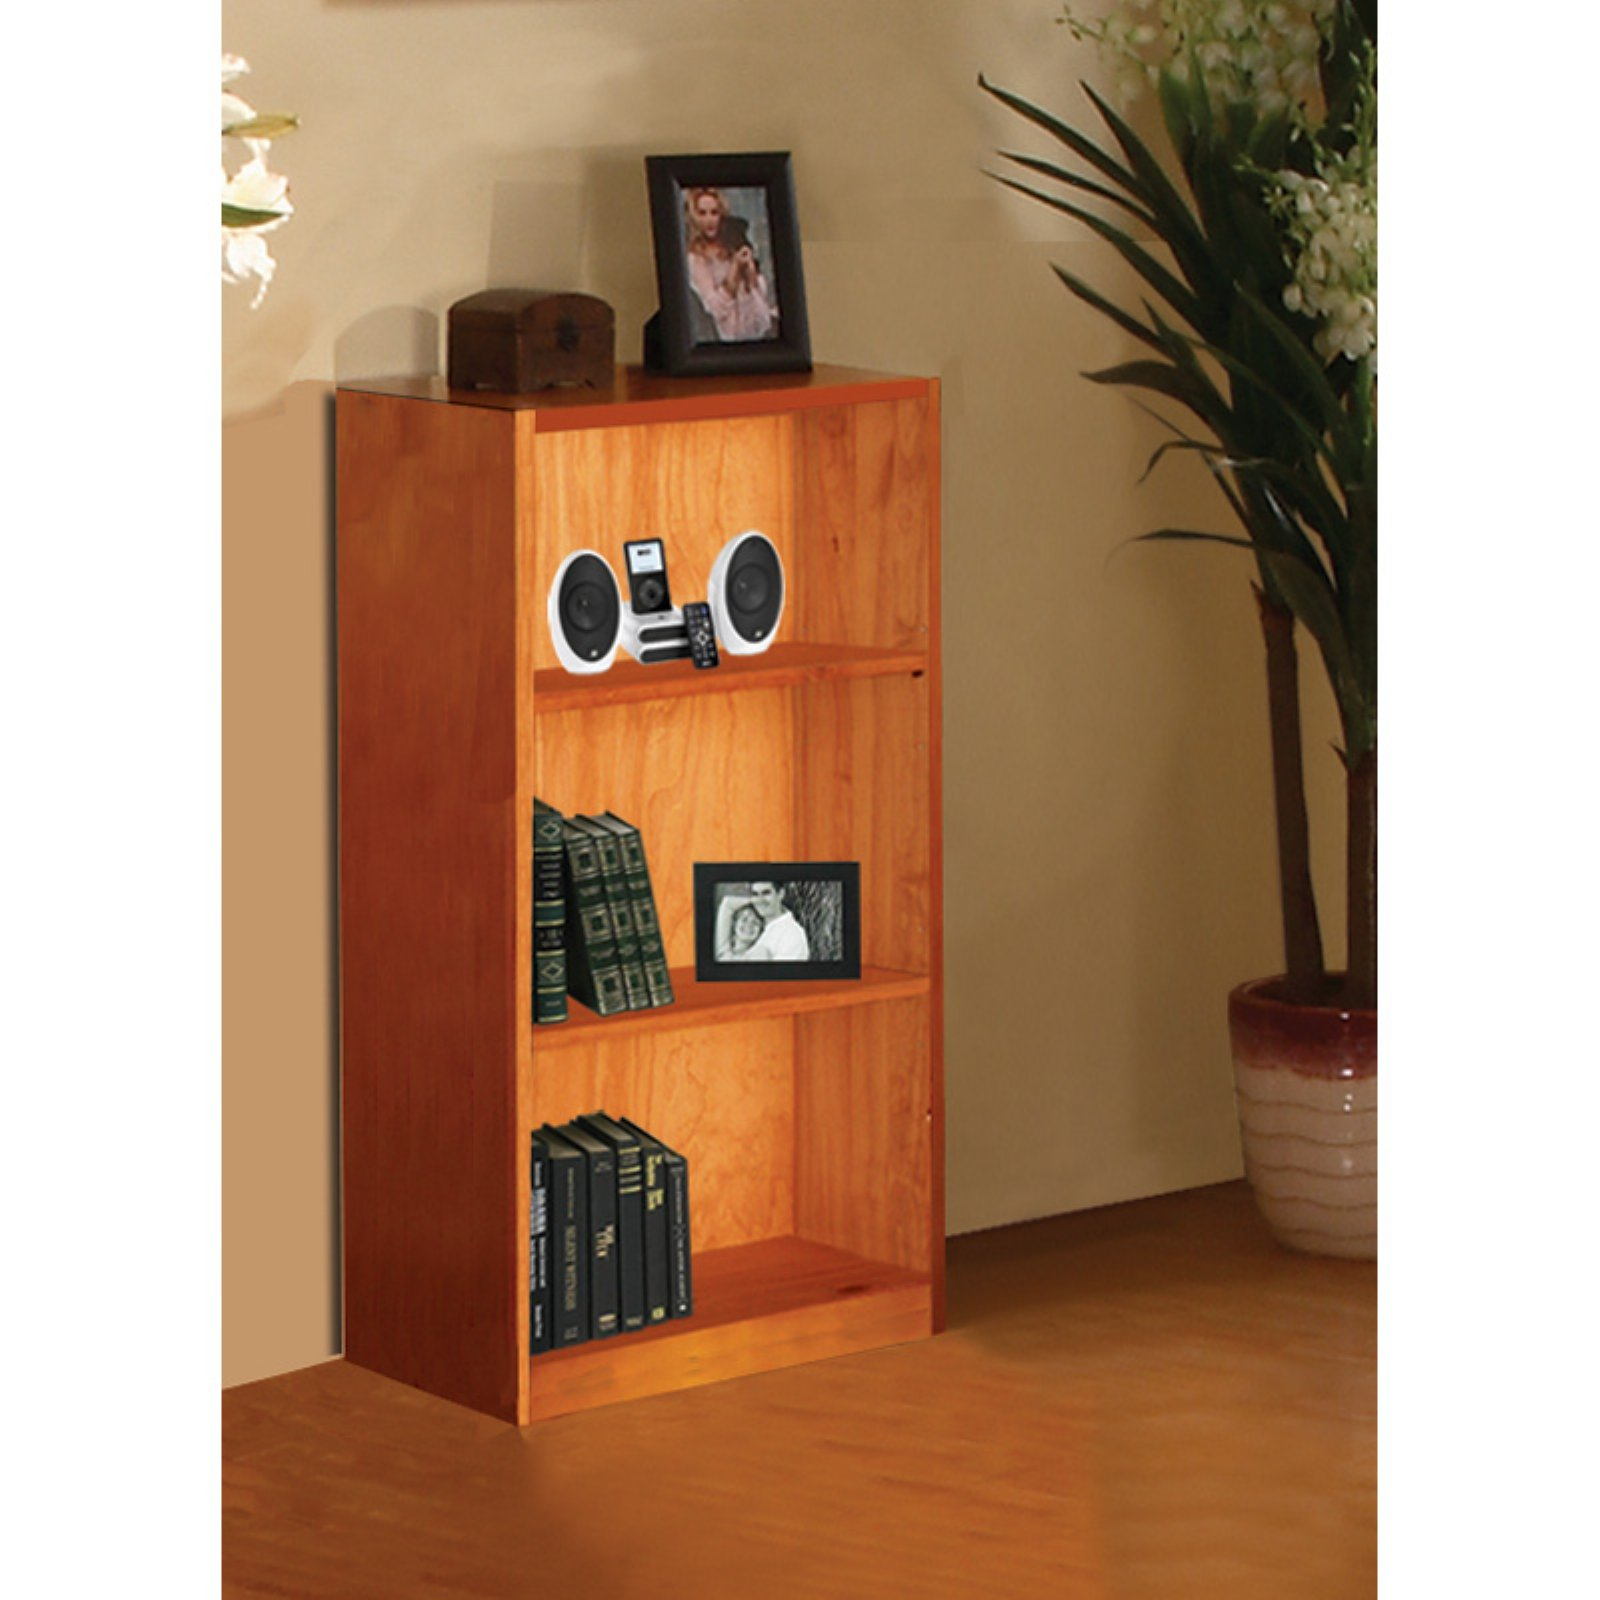 "American Furniture Classics 42"" Bookshelf, Honey Finish"